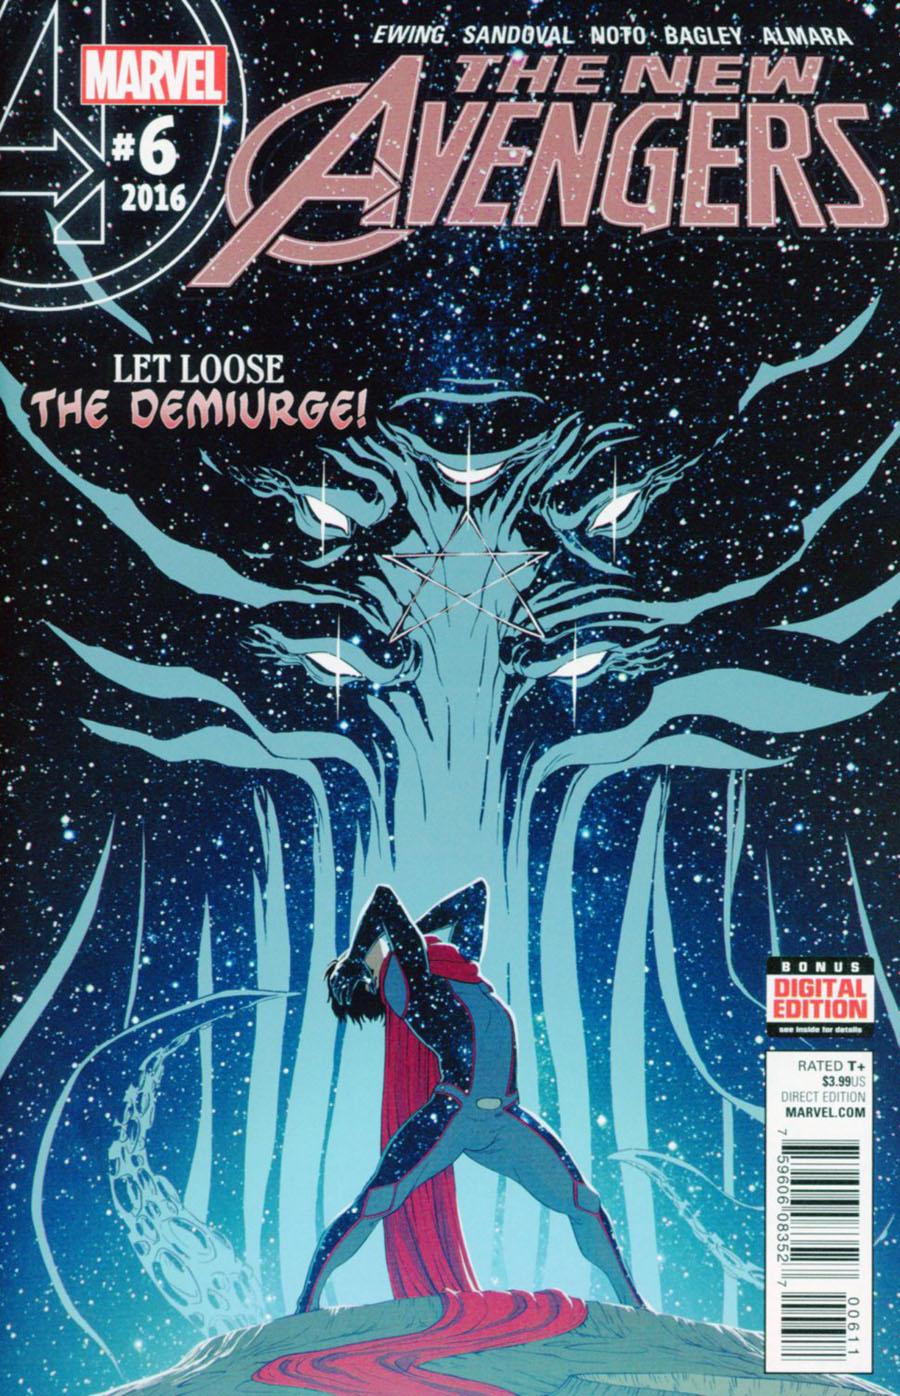 New Avengers Vol 4 #6